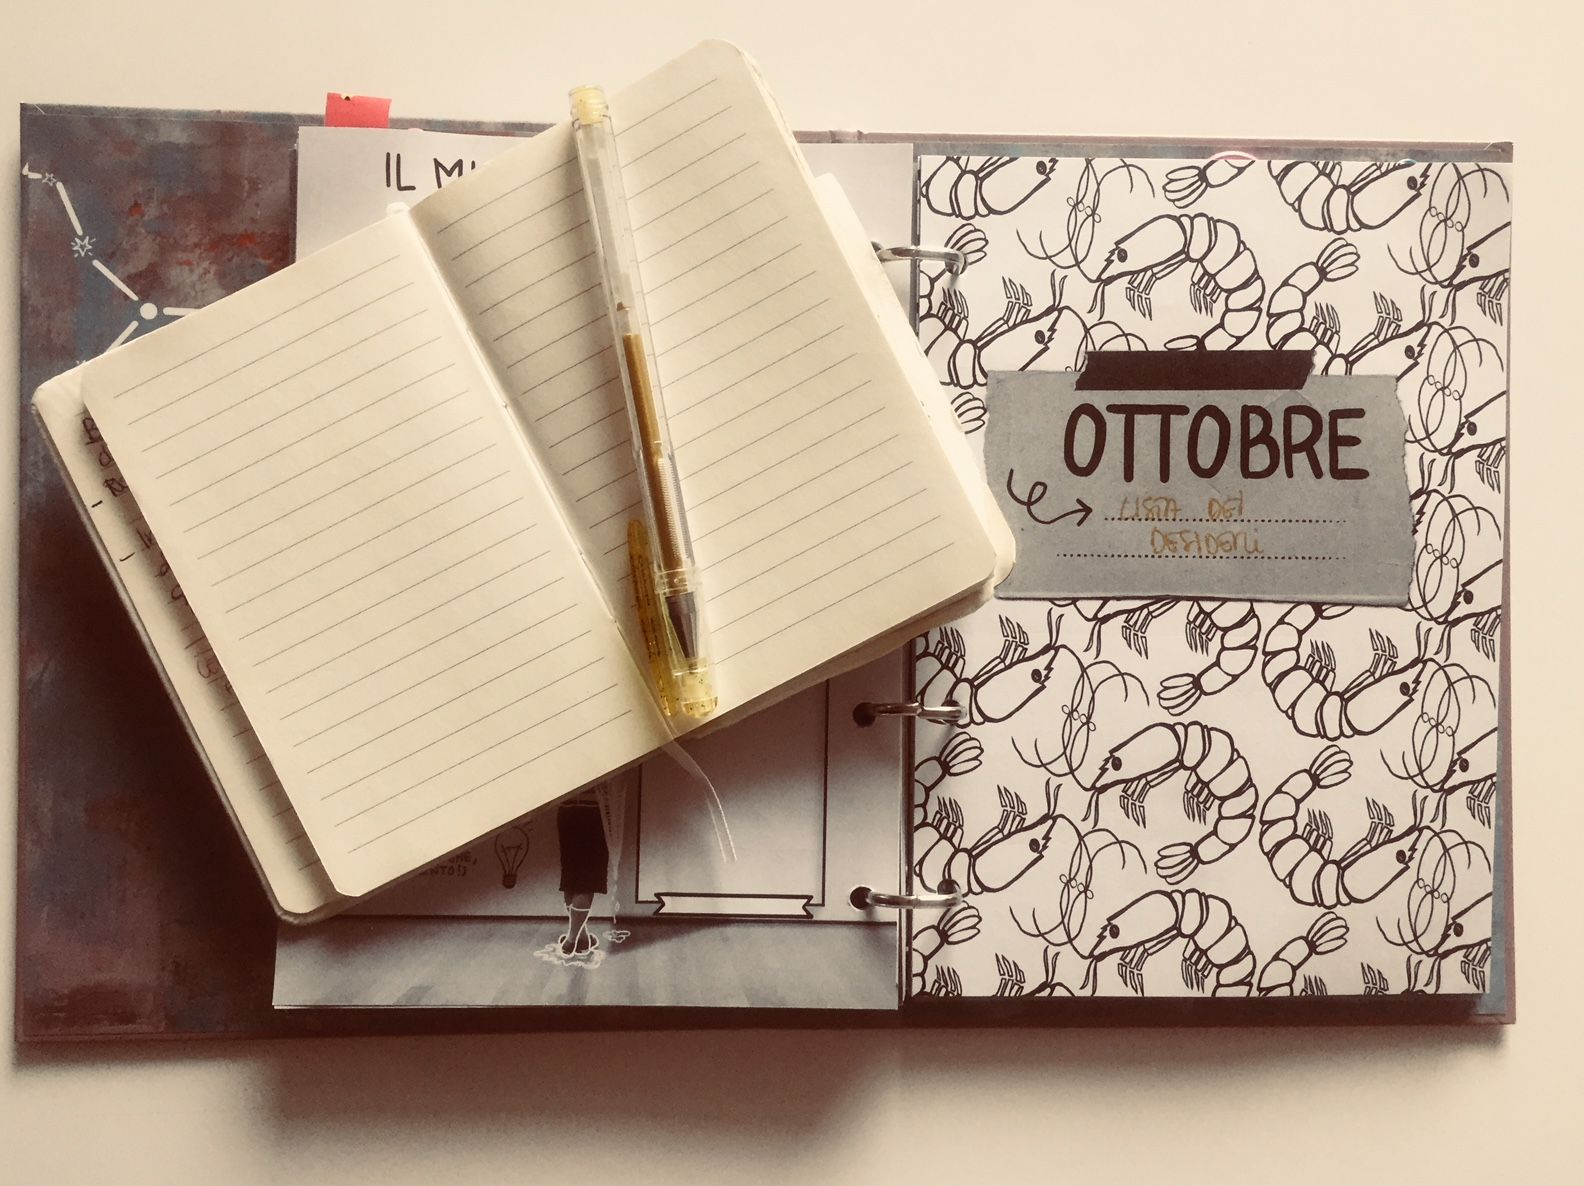 Cosa leggeremo a ottobre?